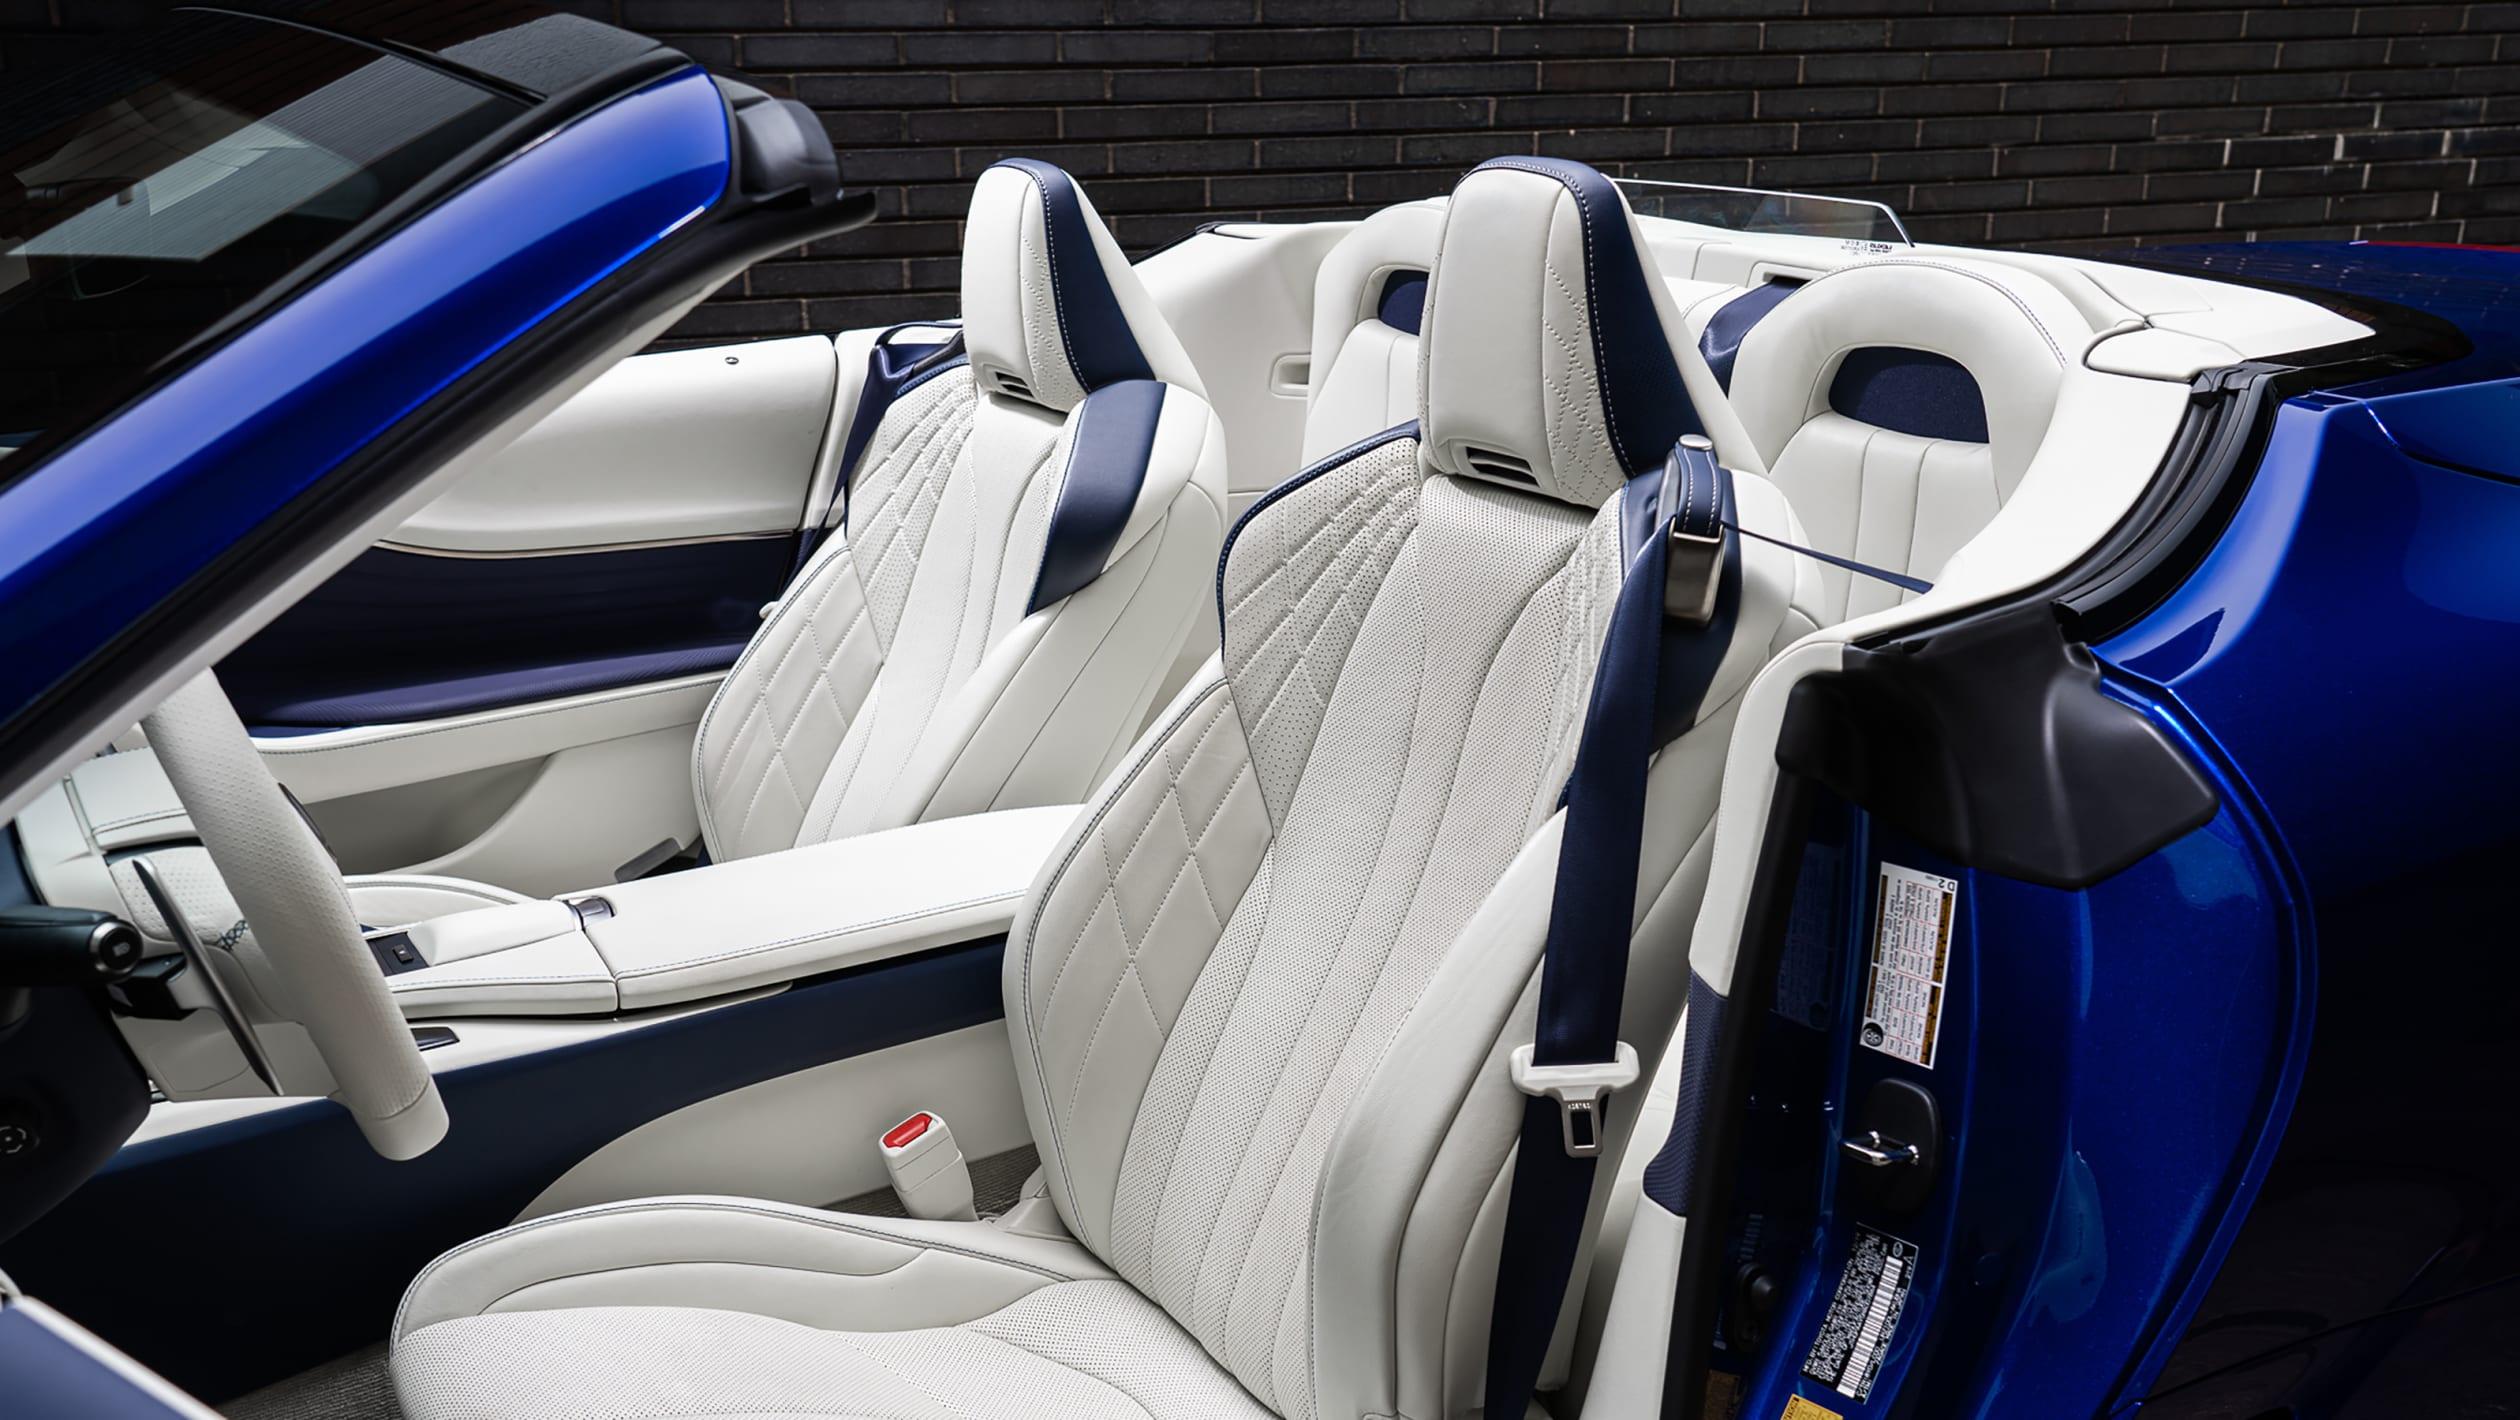 2016 - [Lexus] LC 500 - Page 8 Lexus%20LC%20500%20Convertible%20Regatta